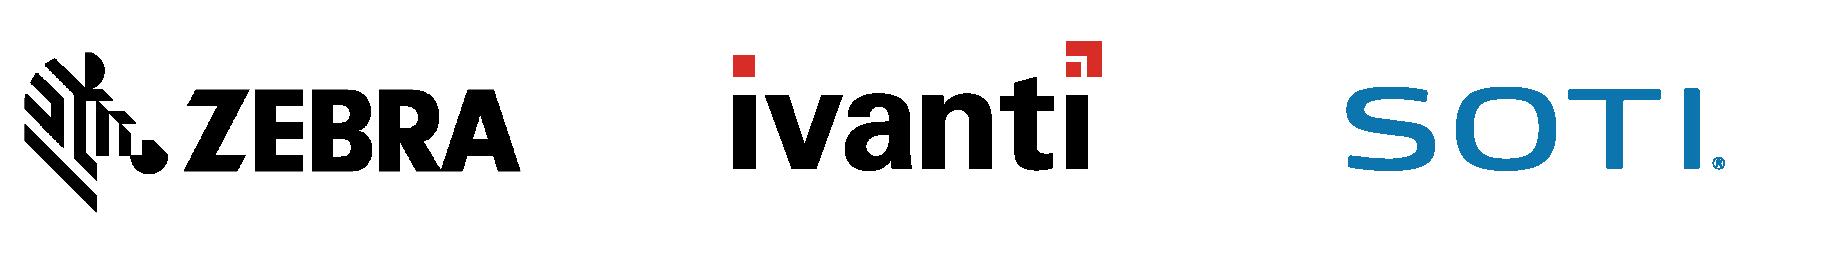 AndroidEnterpriseSponsorsGeekTank-02